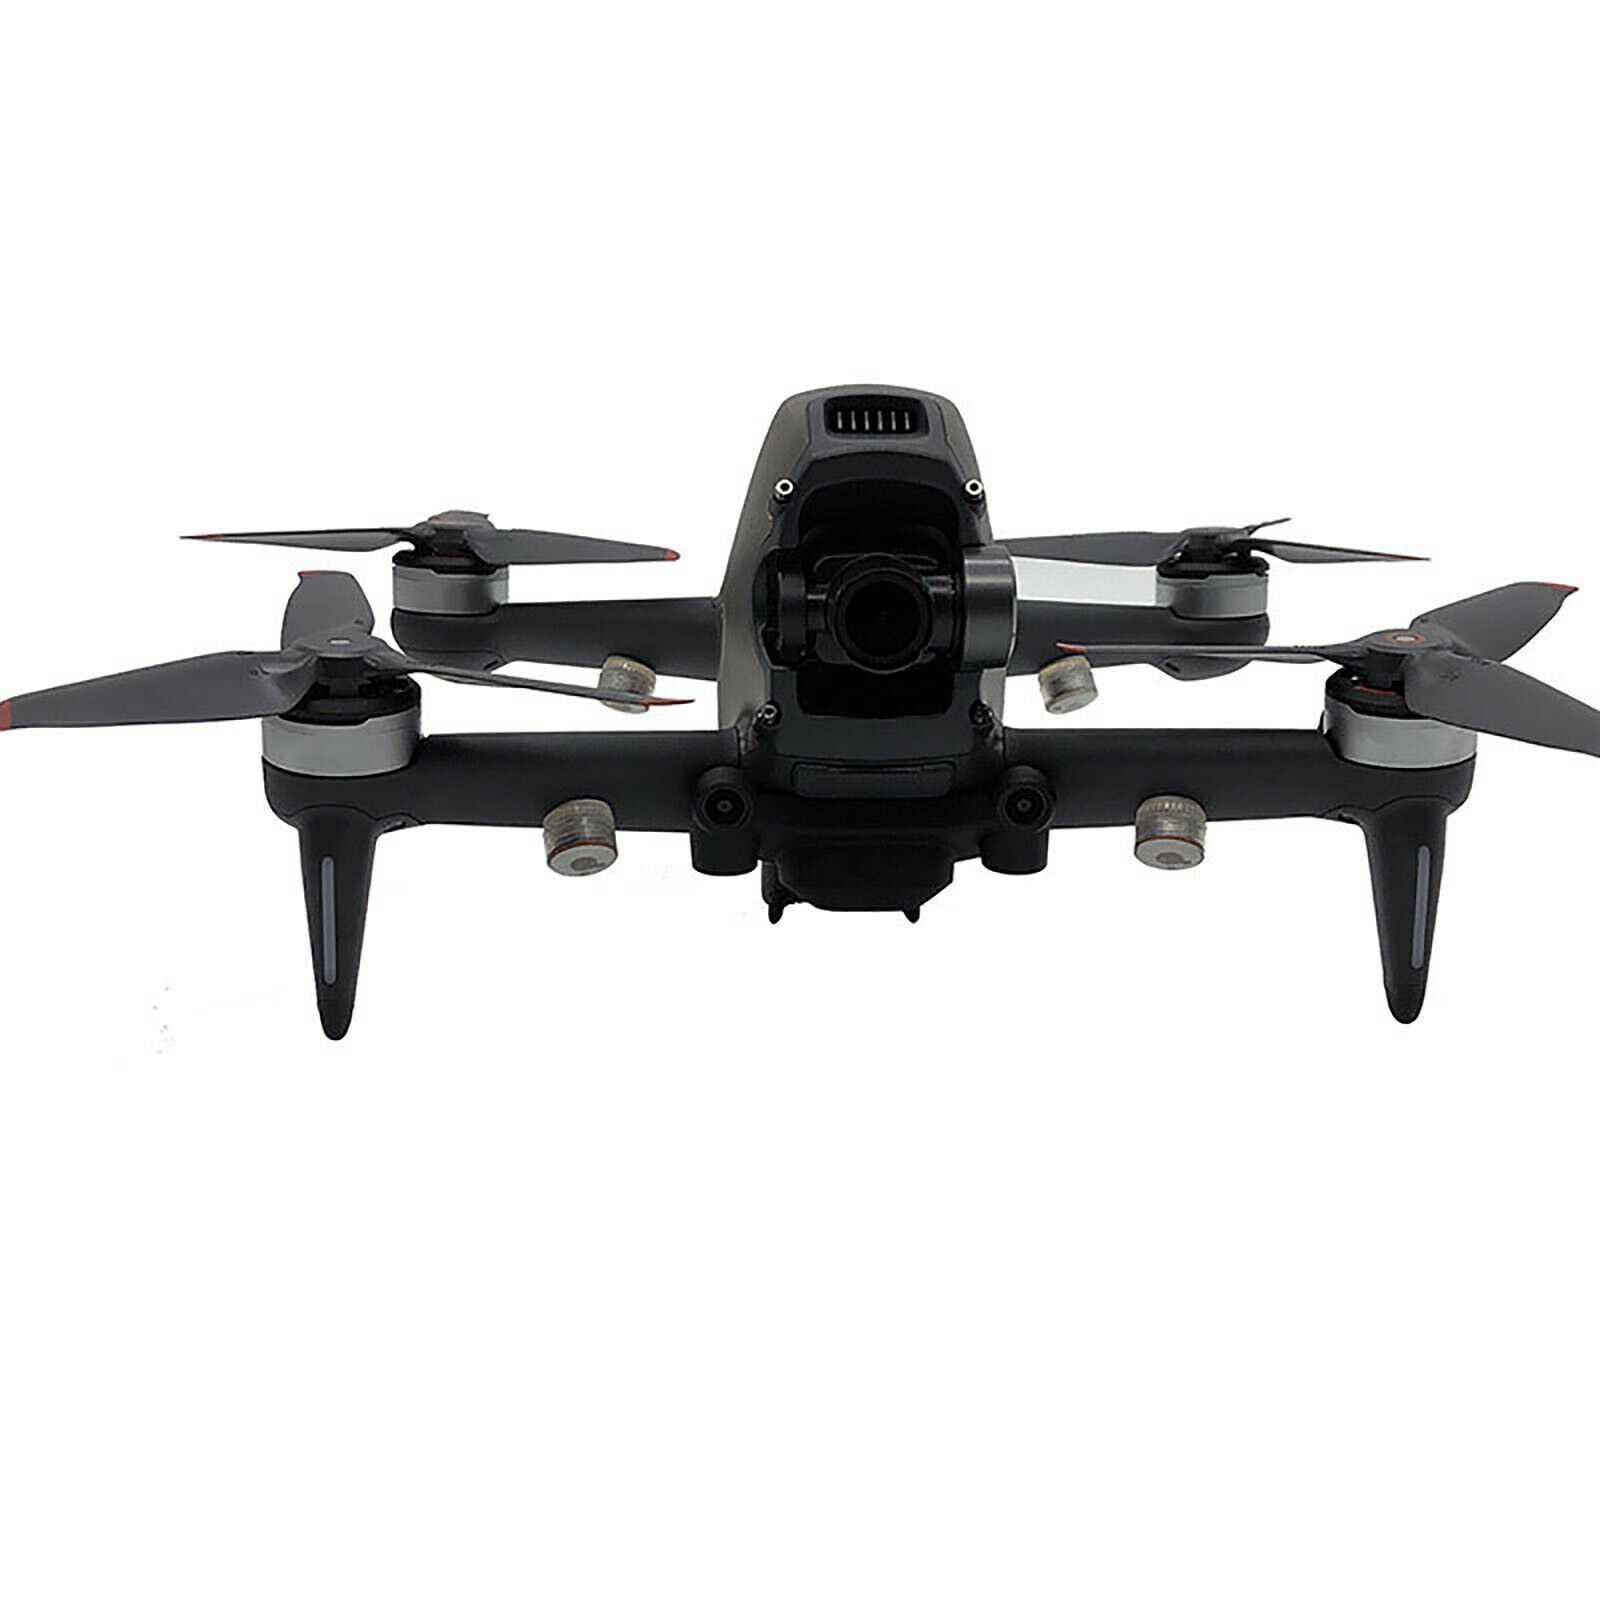 LED Night Flight Strobe Signal Warning Light Set for DJI FPV Drone Accessories